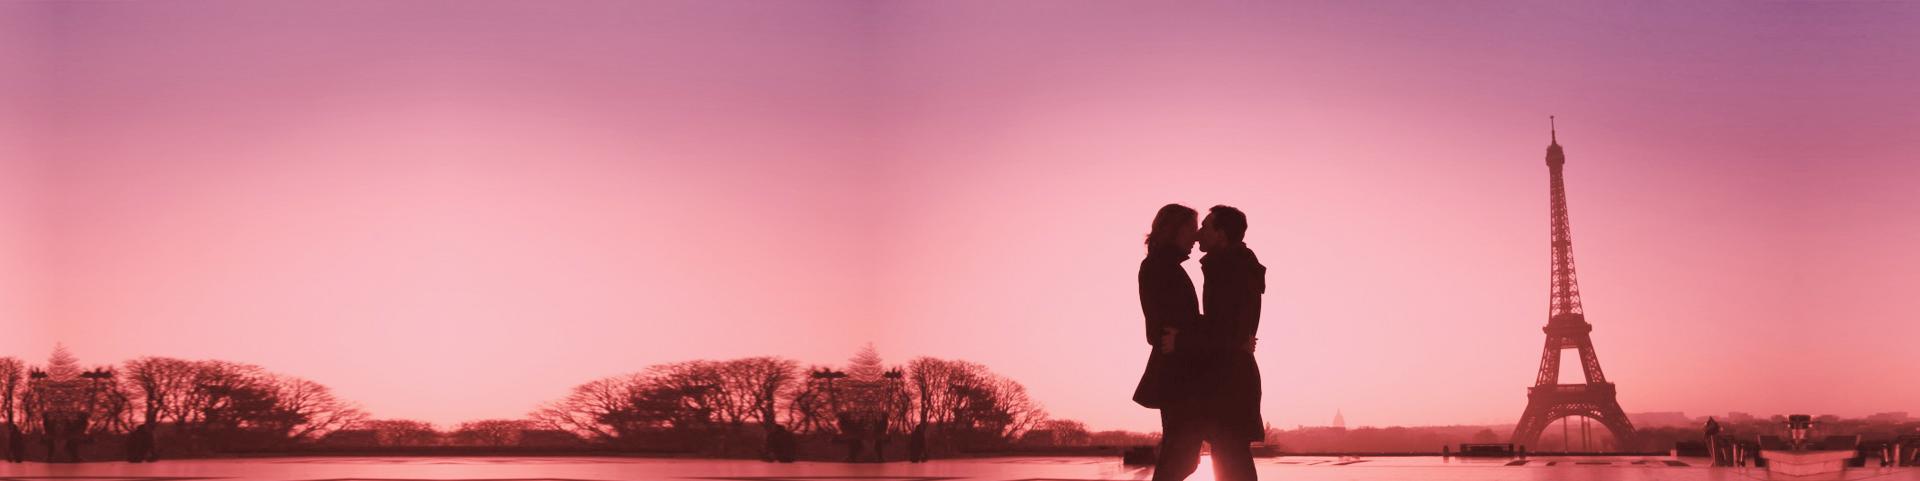 header-romance-place